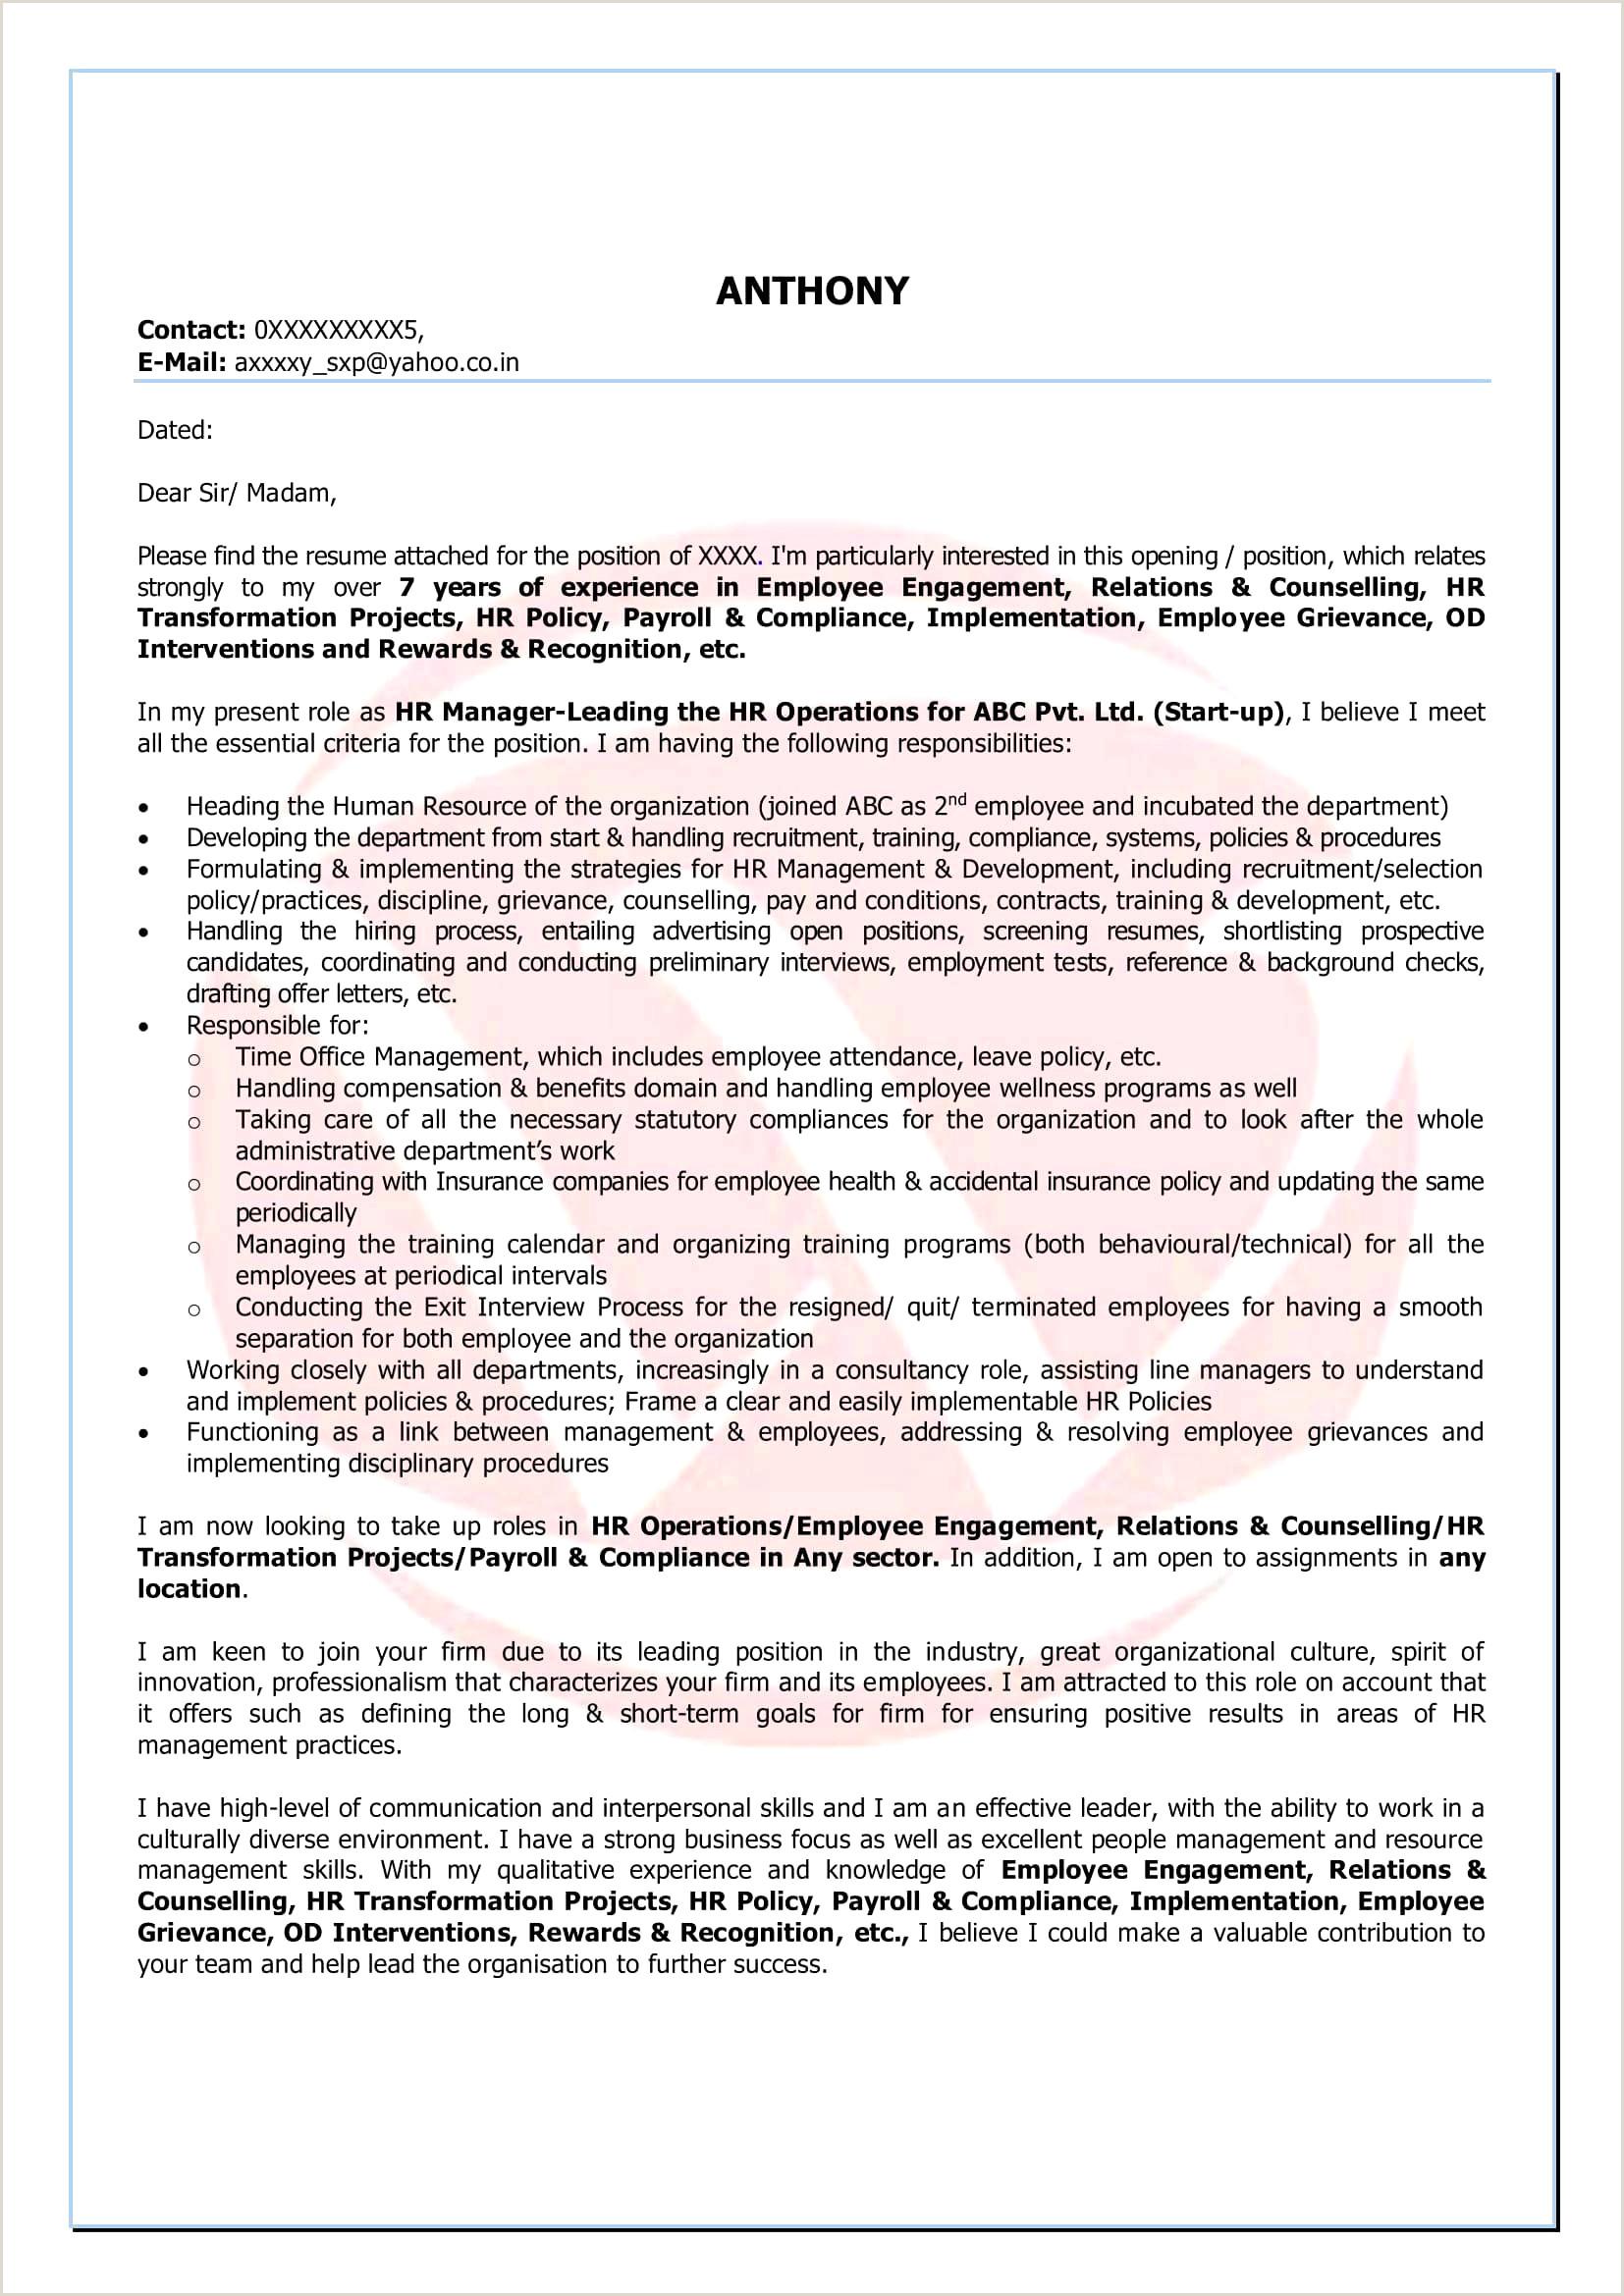 Medical Billing Cover Letter Entry Level New Coding Resume